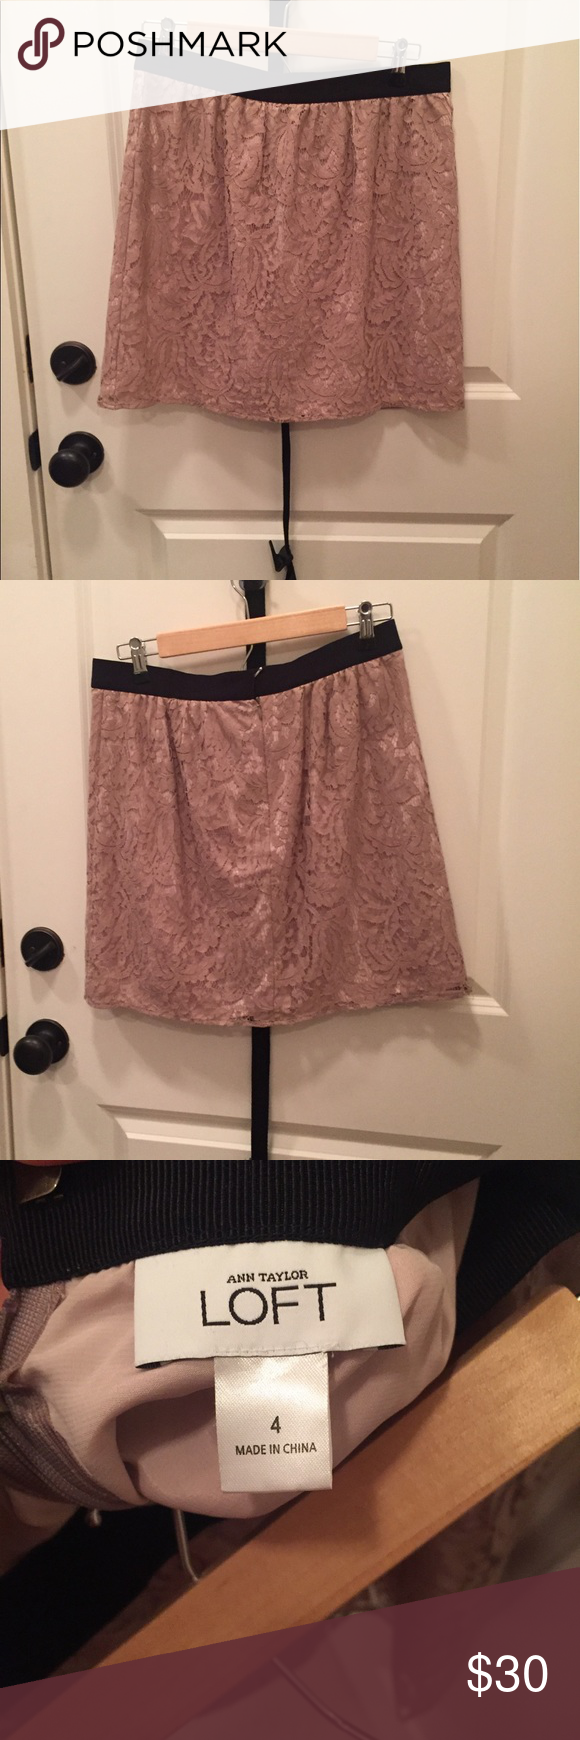 Ann Taylor Loft Skirt Blush Pink Ann Taylor Loft Skirt lace skirt, Size 4. Invisible zipper at center back. Above knee. Smoke free home. Ann Taylor Loft Skirts Mini